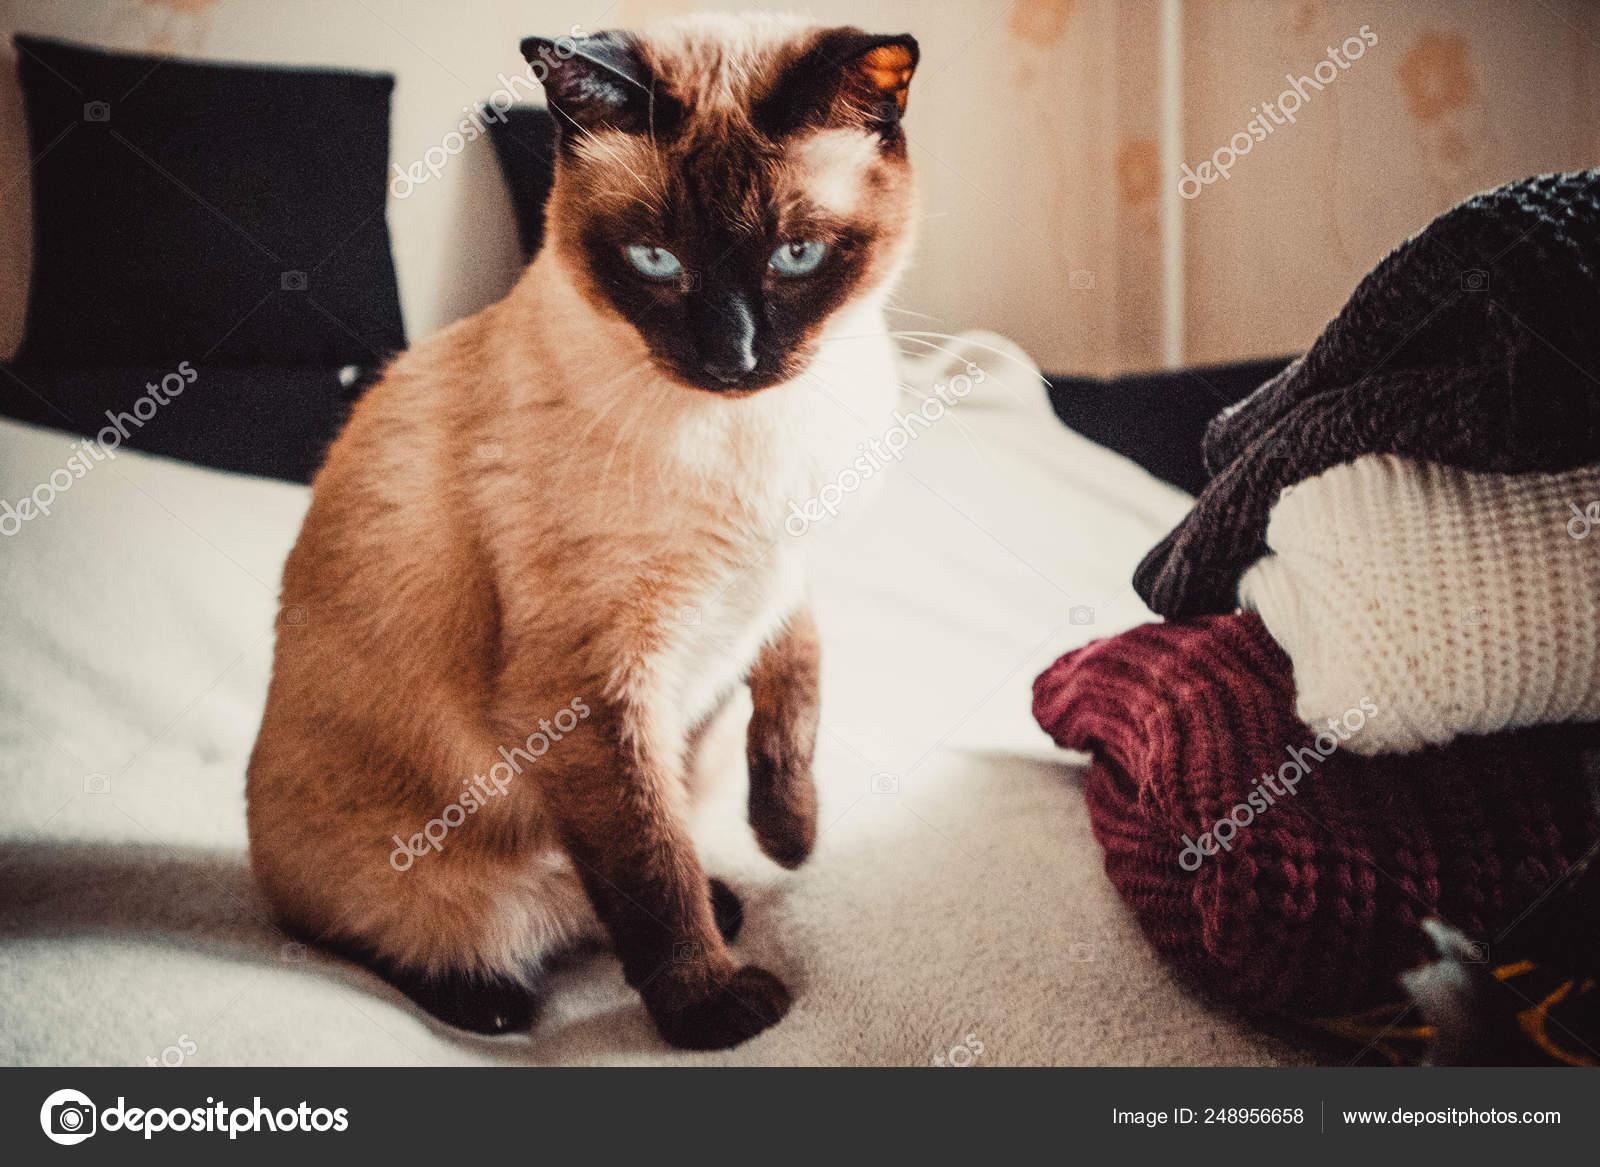 Cat Sweaters Soft Background \u2014 Stock Photo © sysoniuk.irina